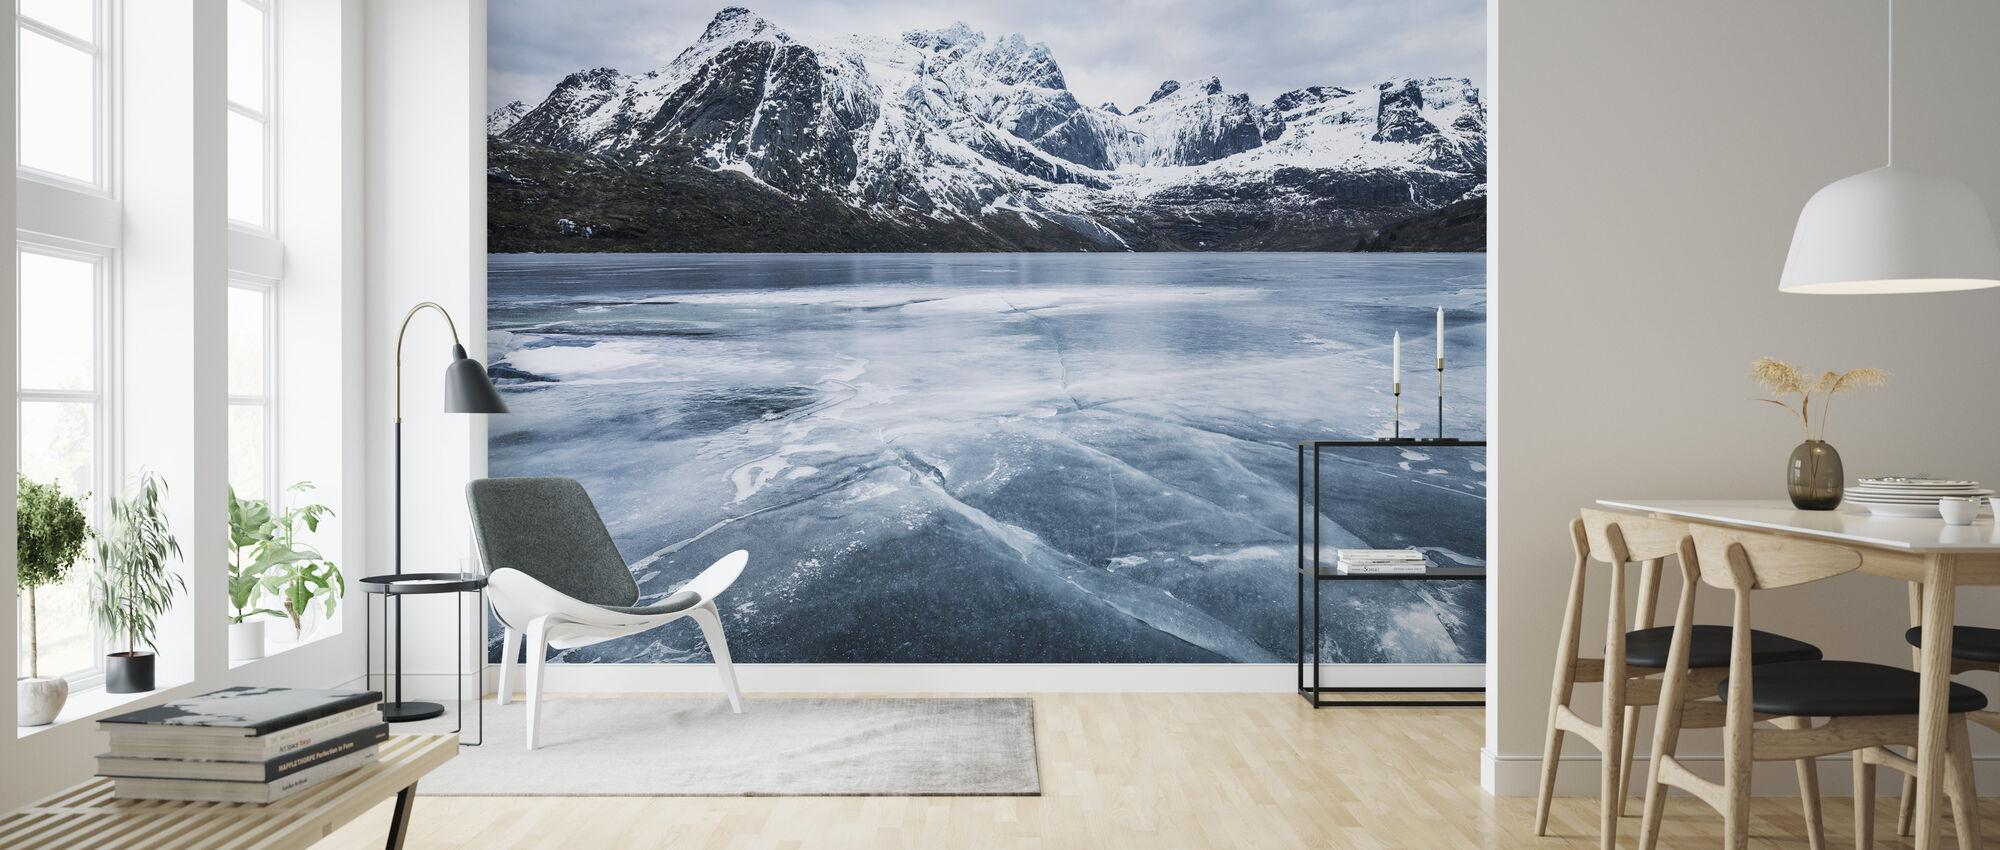 Frozen Water and Mountain Range - Wallpaper - Living Room